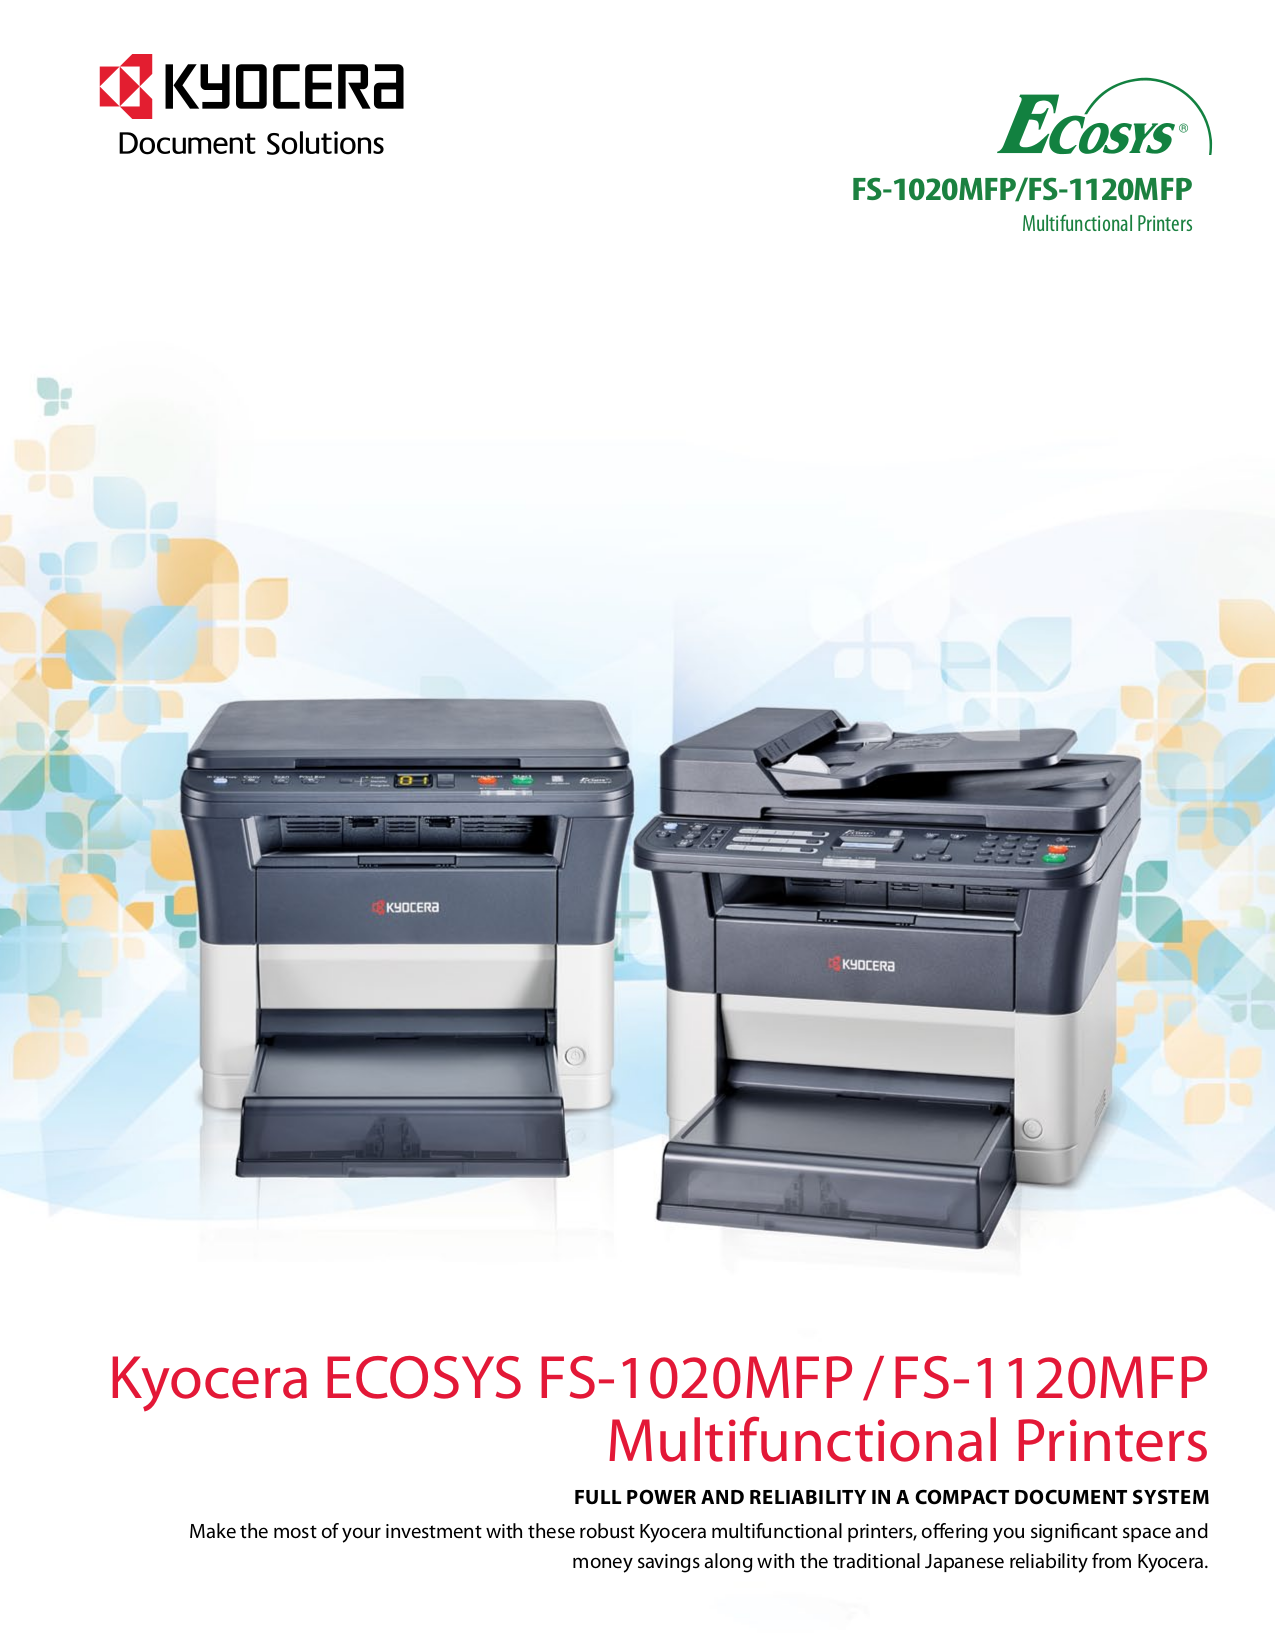 Fs-1020mfp kyocera pdf инструкция на русском